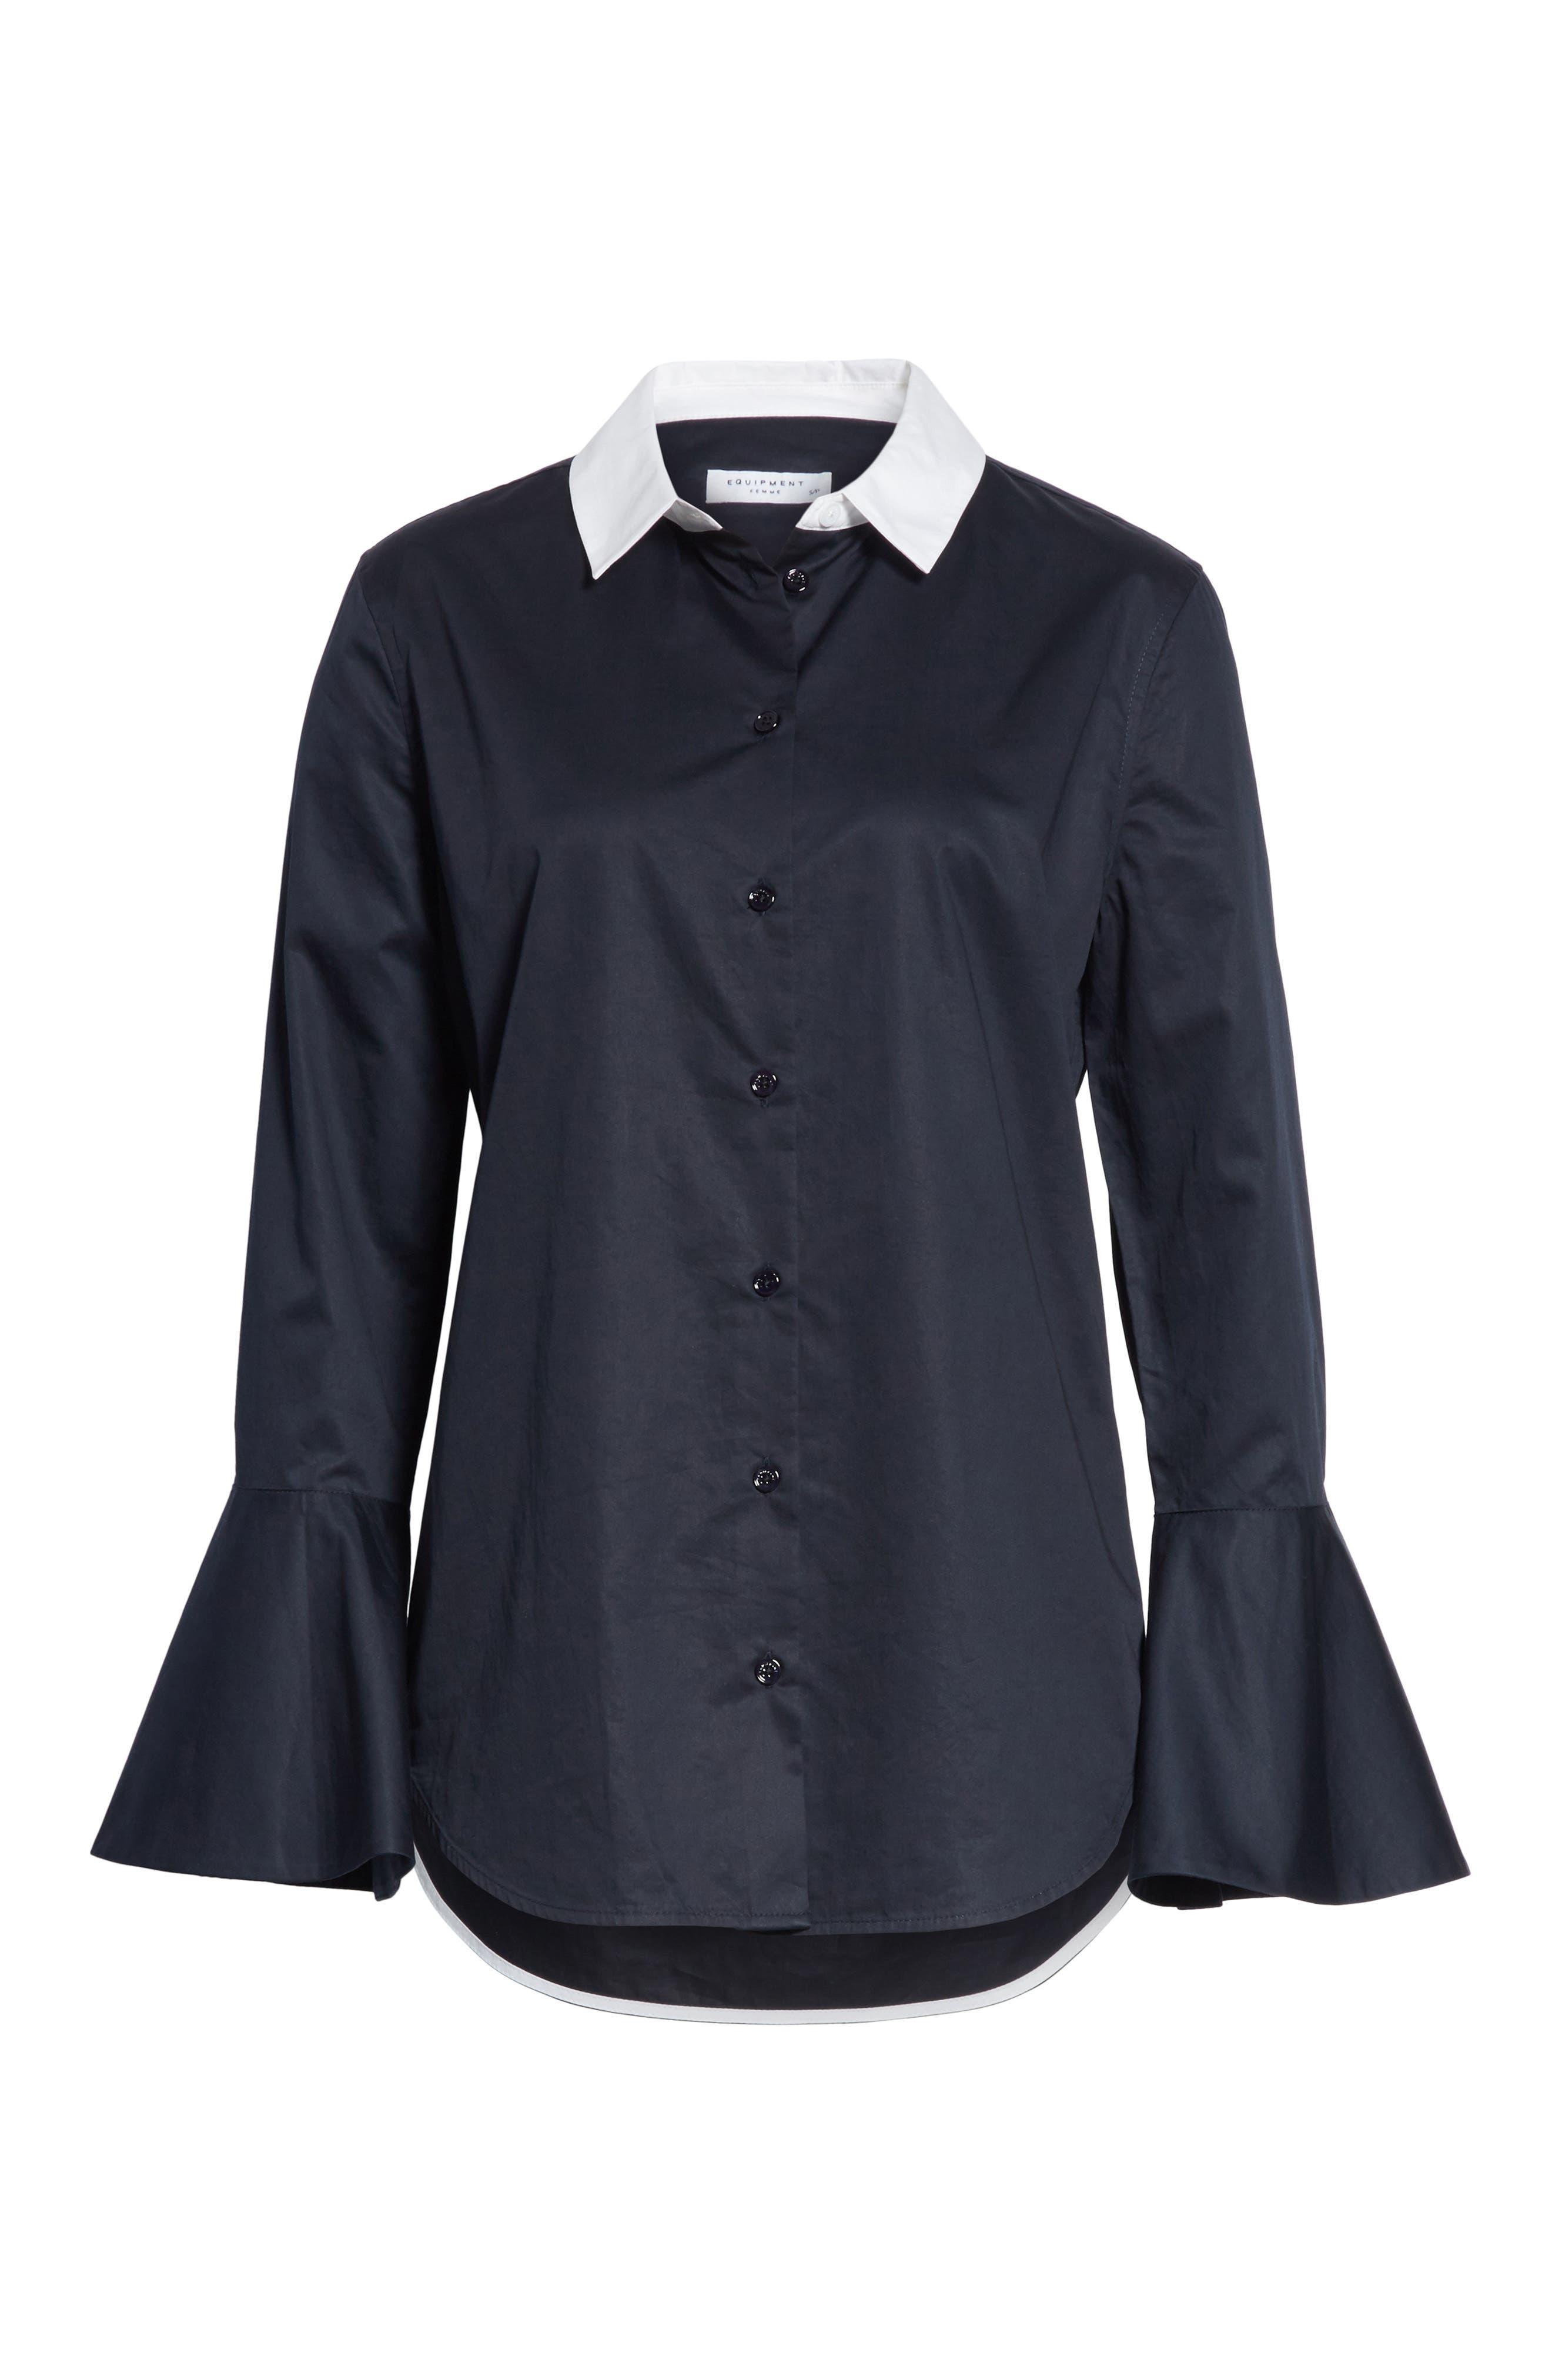 Darla Bell Cuff Shirt,                             Alternate thumbnail 6, color,                             Eclipse